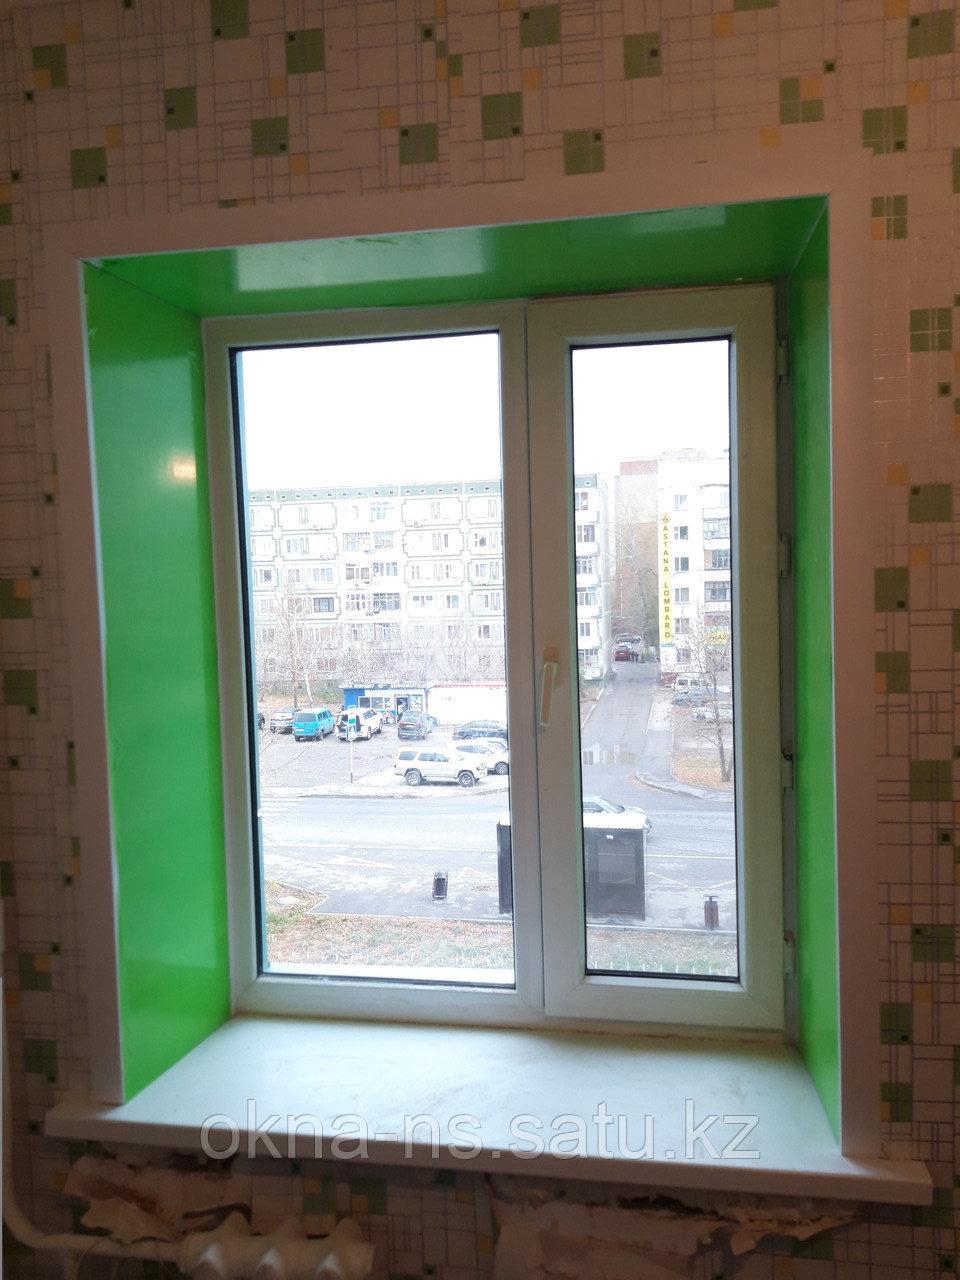 Пластиковые окна Астана - фото 4